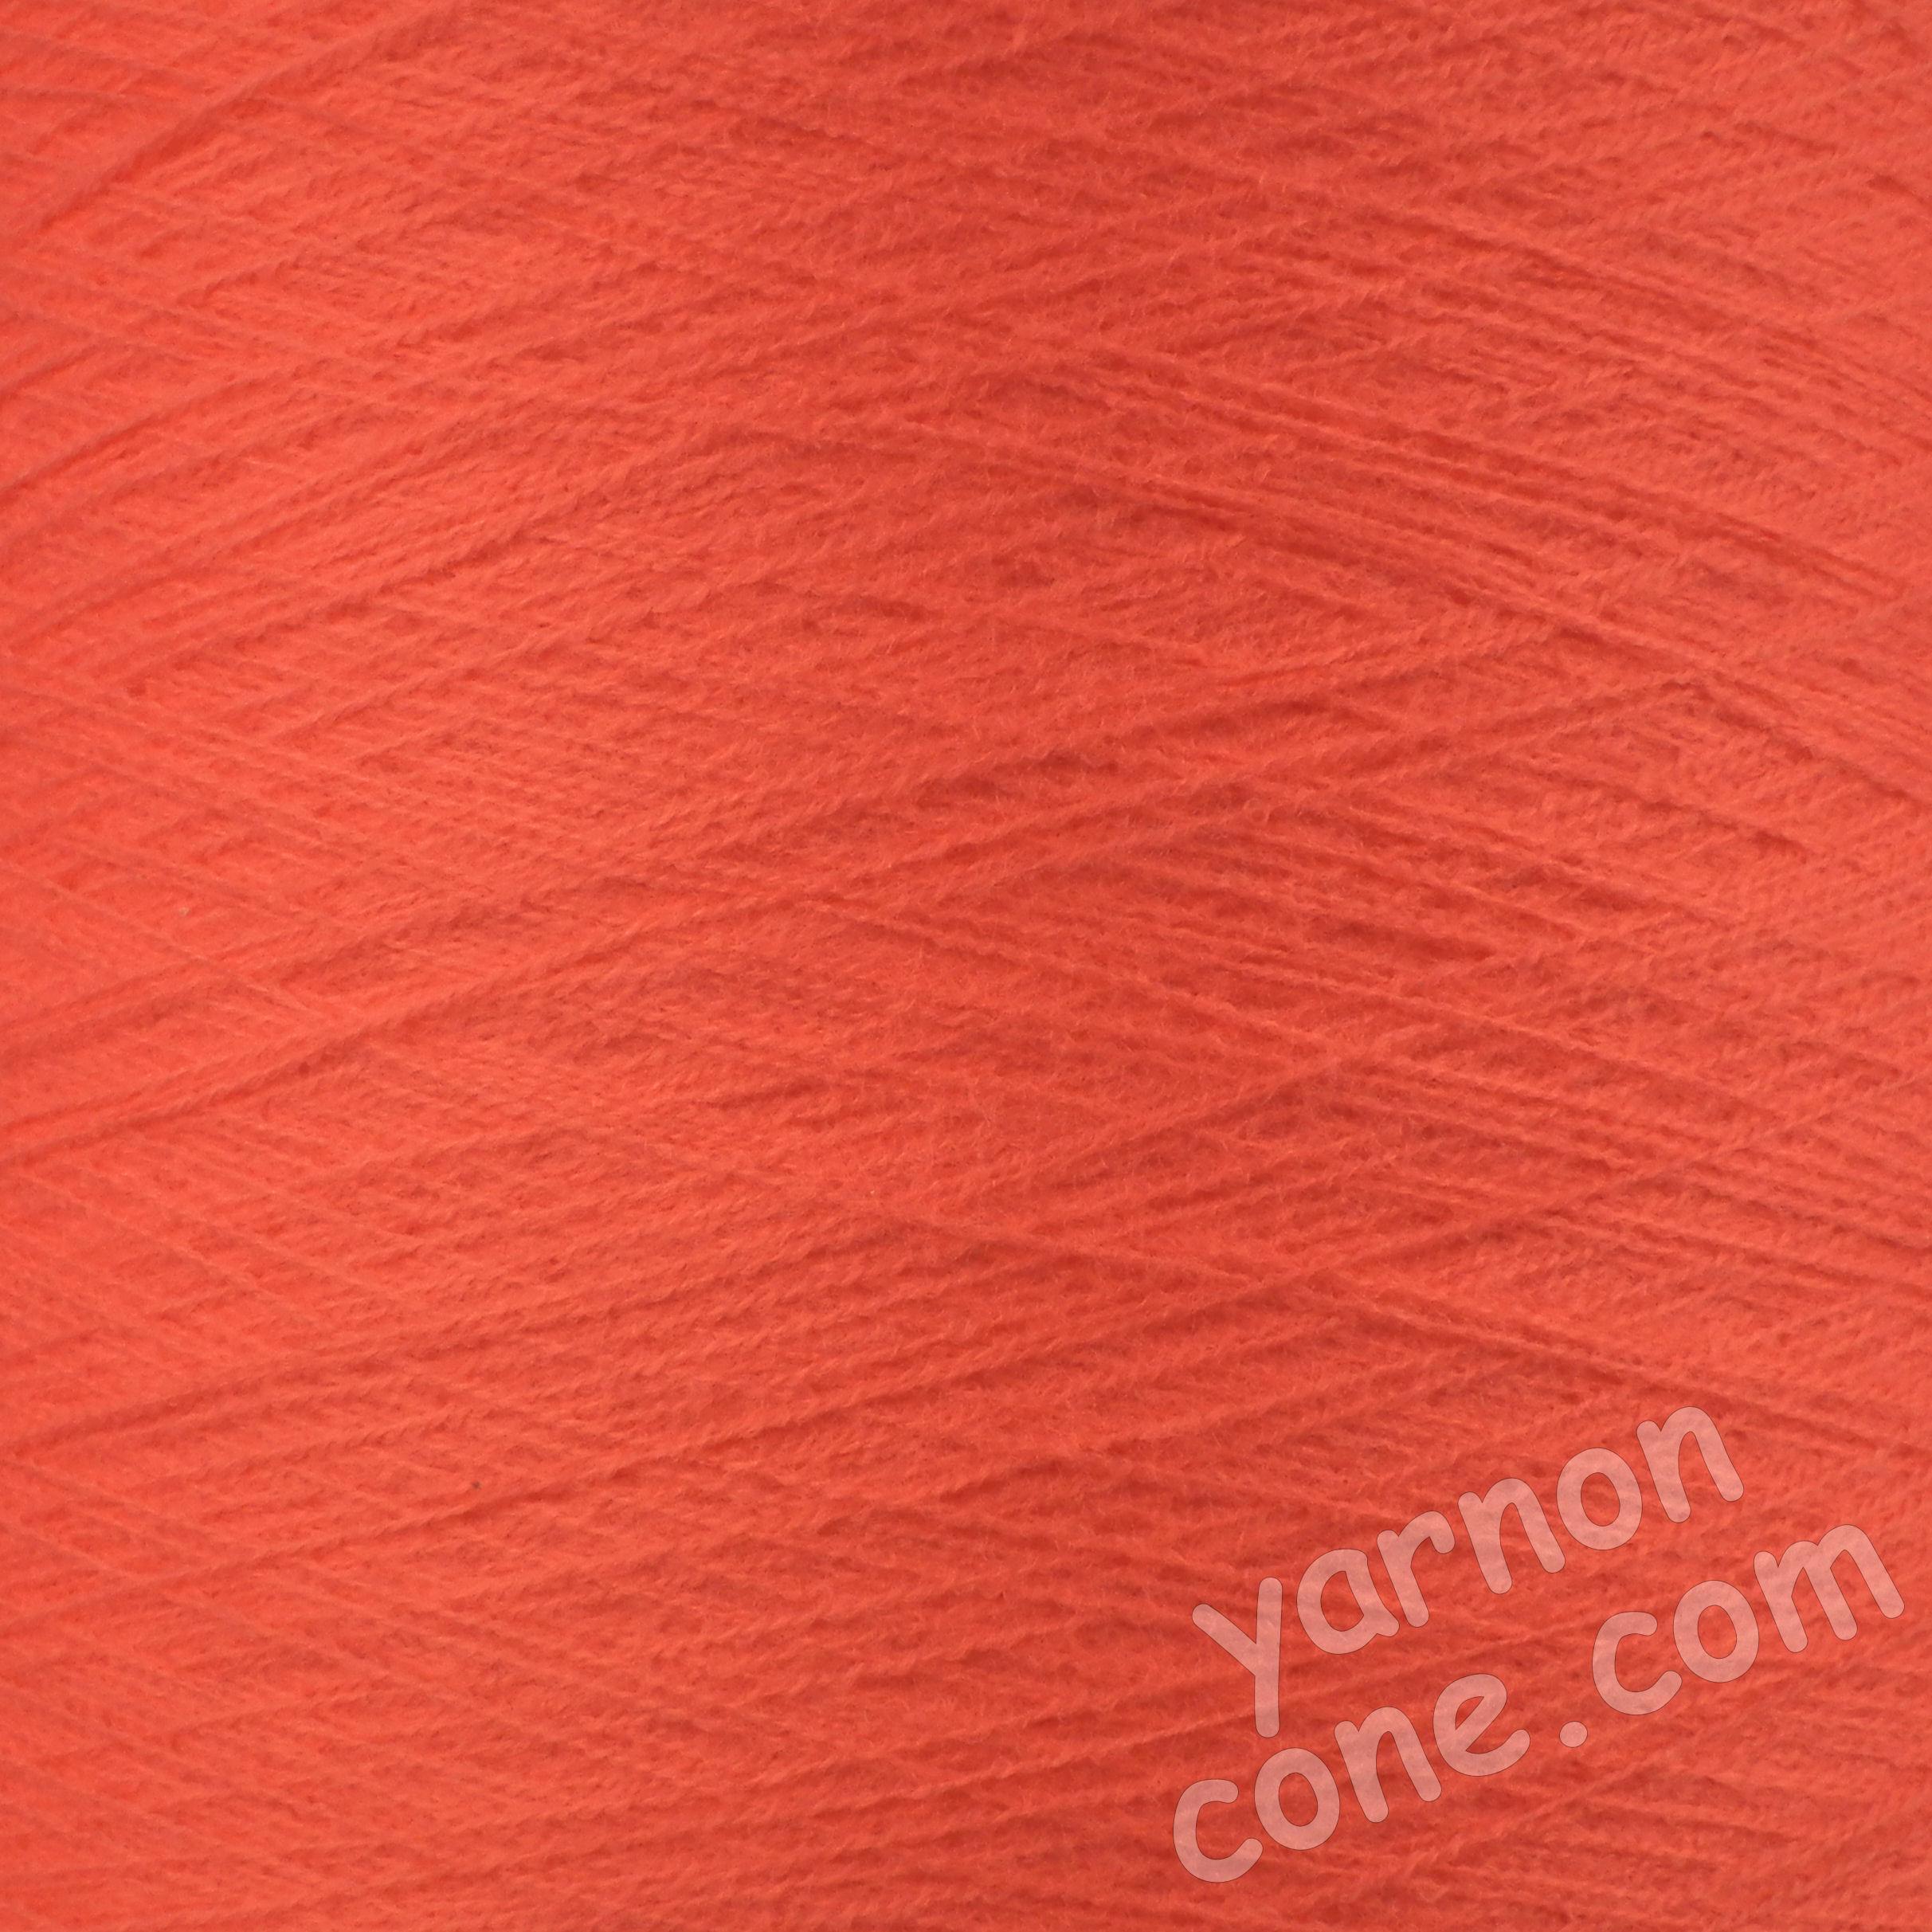 2/30s high bulk acrylic machine knitting yarn on cone 1 2 ply soft coral